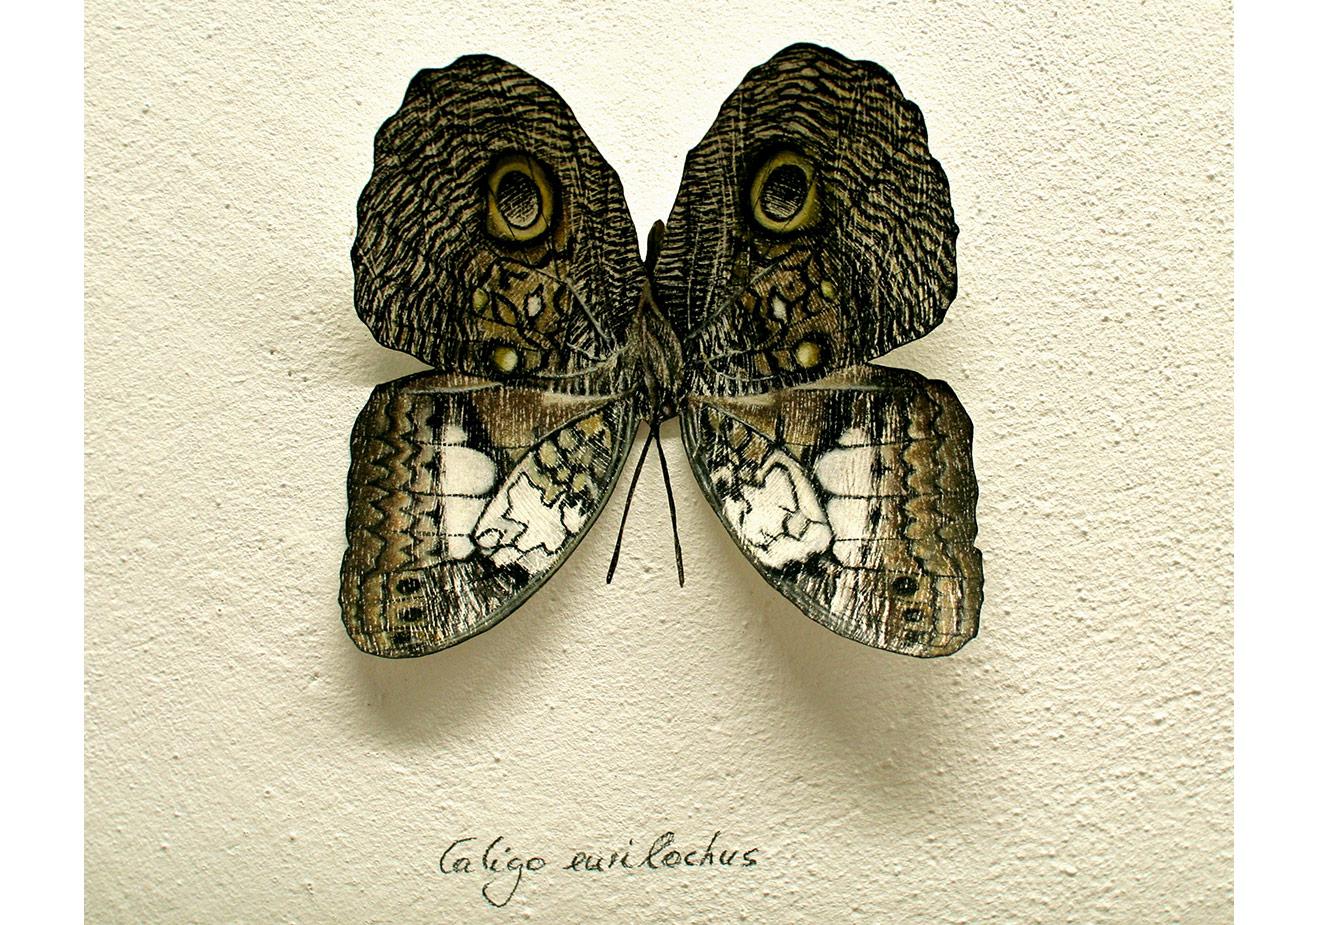 Five eyes (Caligo) - Kağıt üzerine pastel ve kağıt kesim, 13cm x 13cm x 3cm, 2015 - Copyright Svenja Schüffler